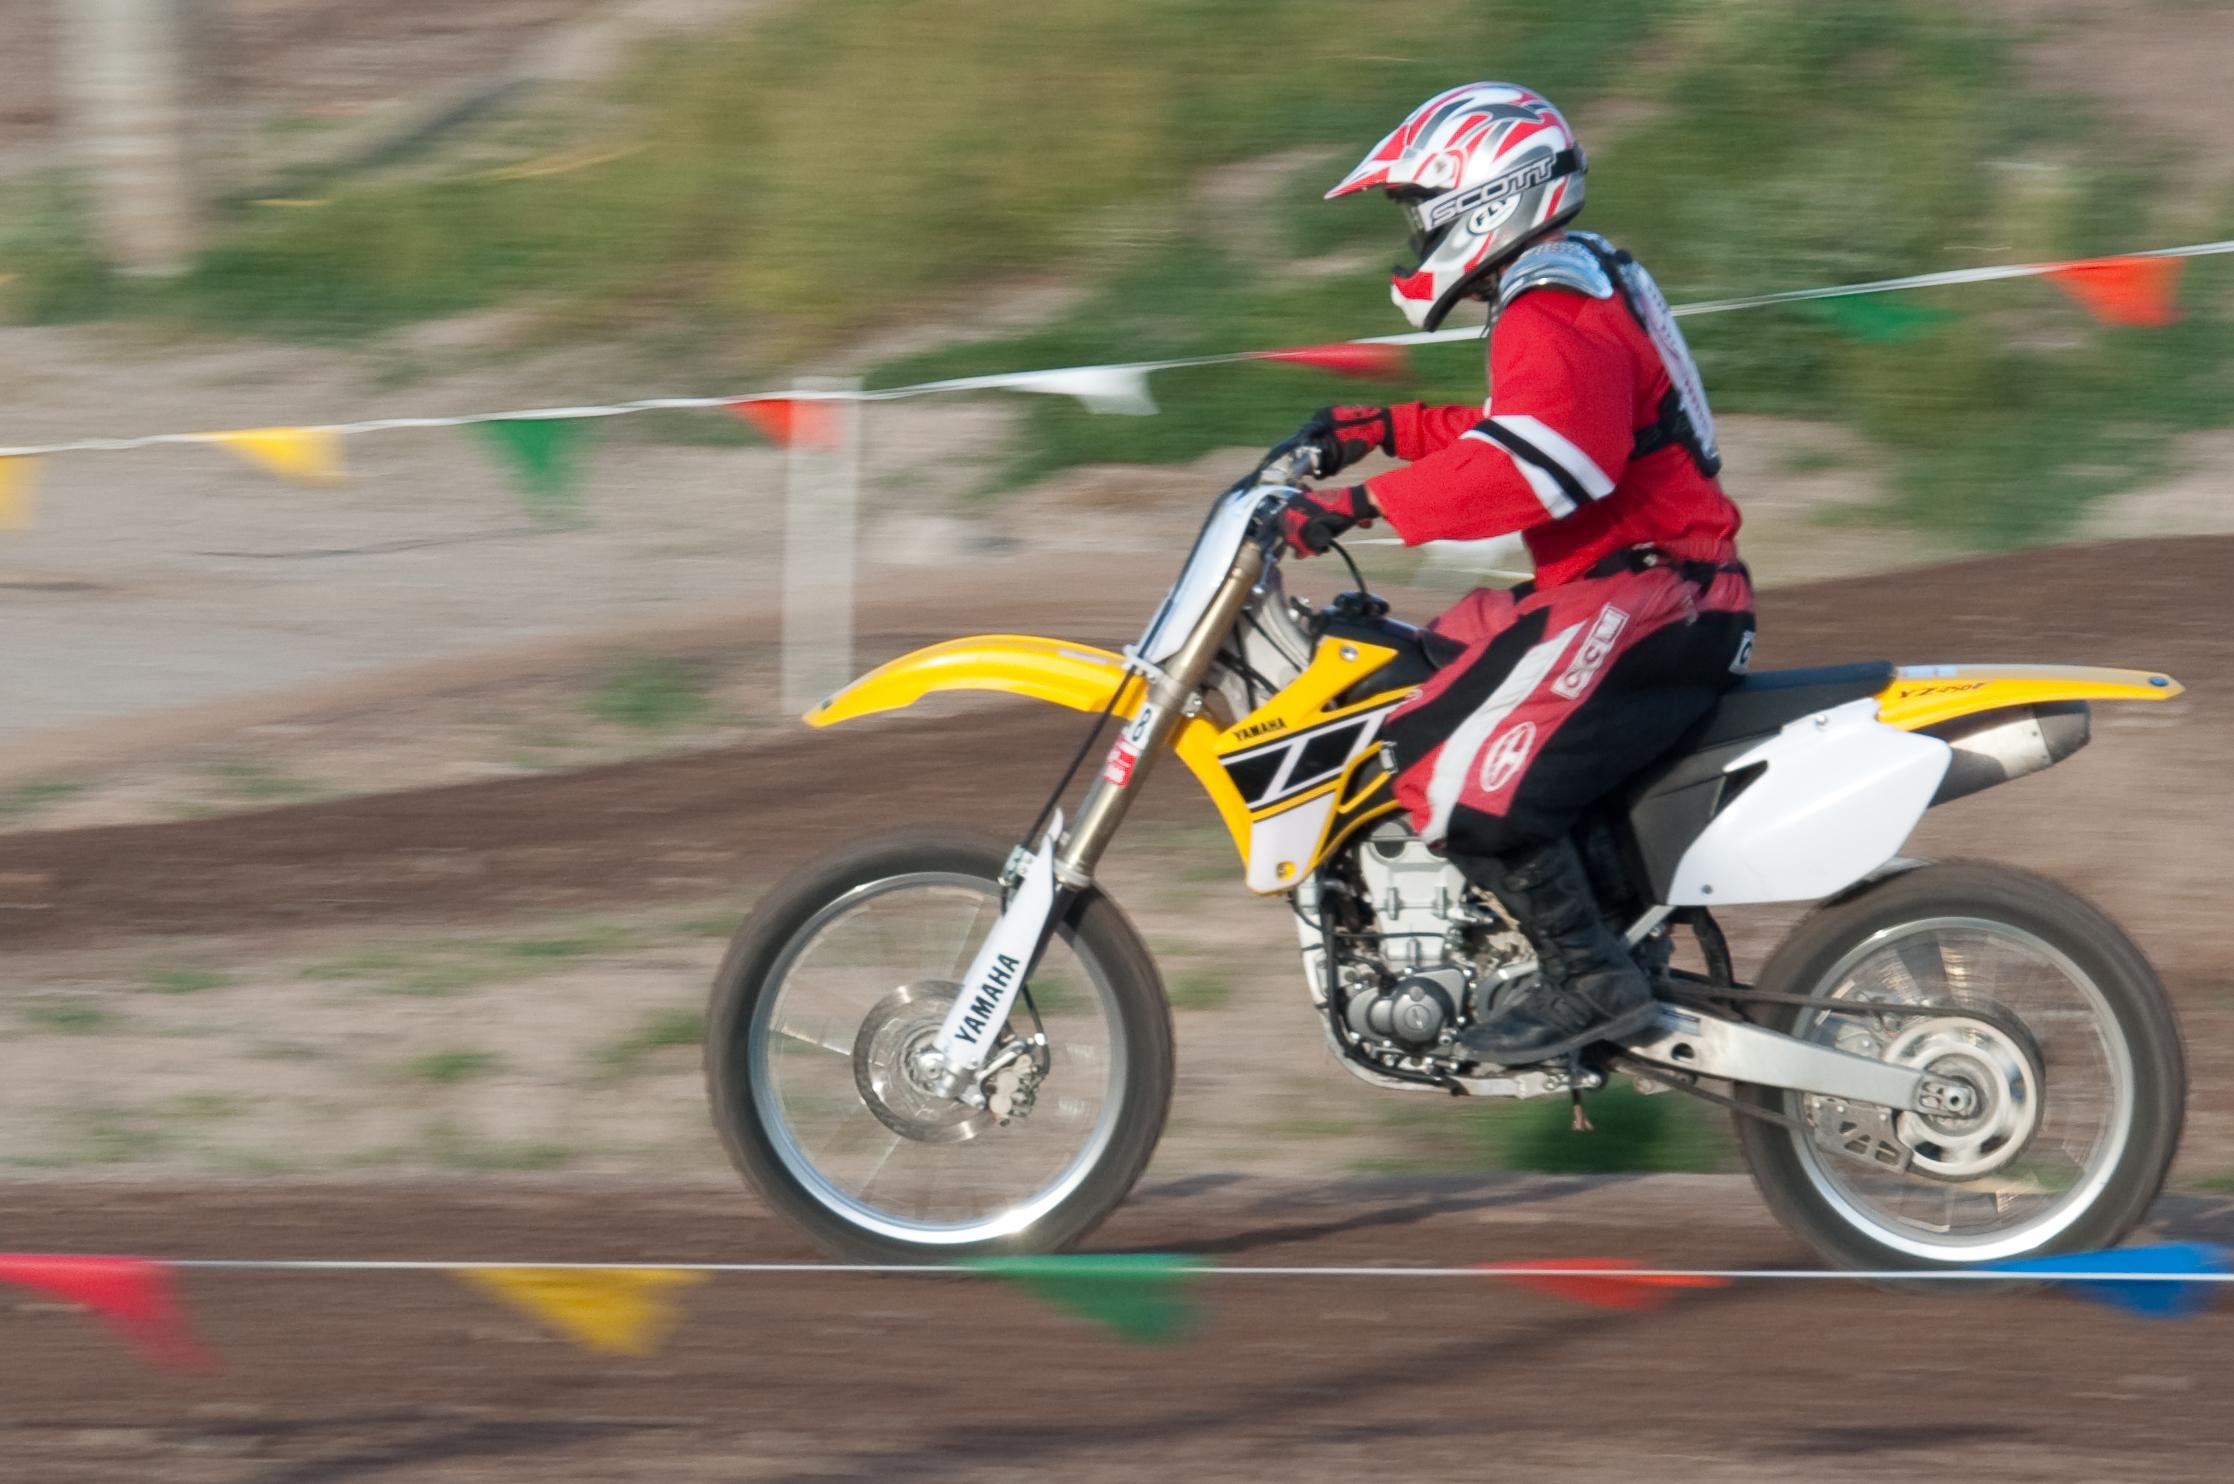 Rocky mountain raceway motocross explore jake pollmann 39 s for Rocky mountain motor sports